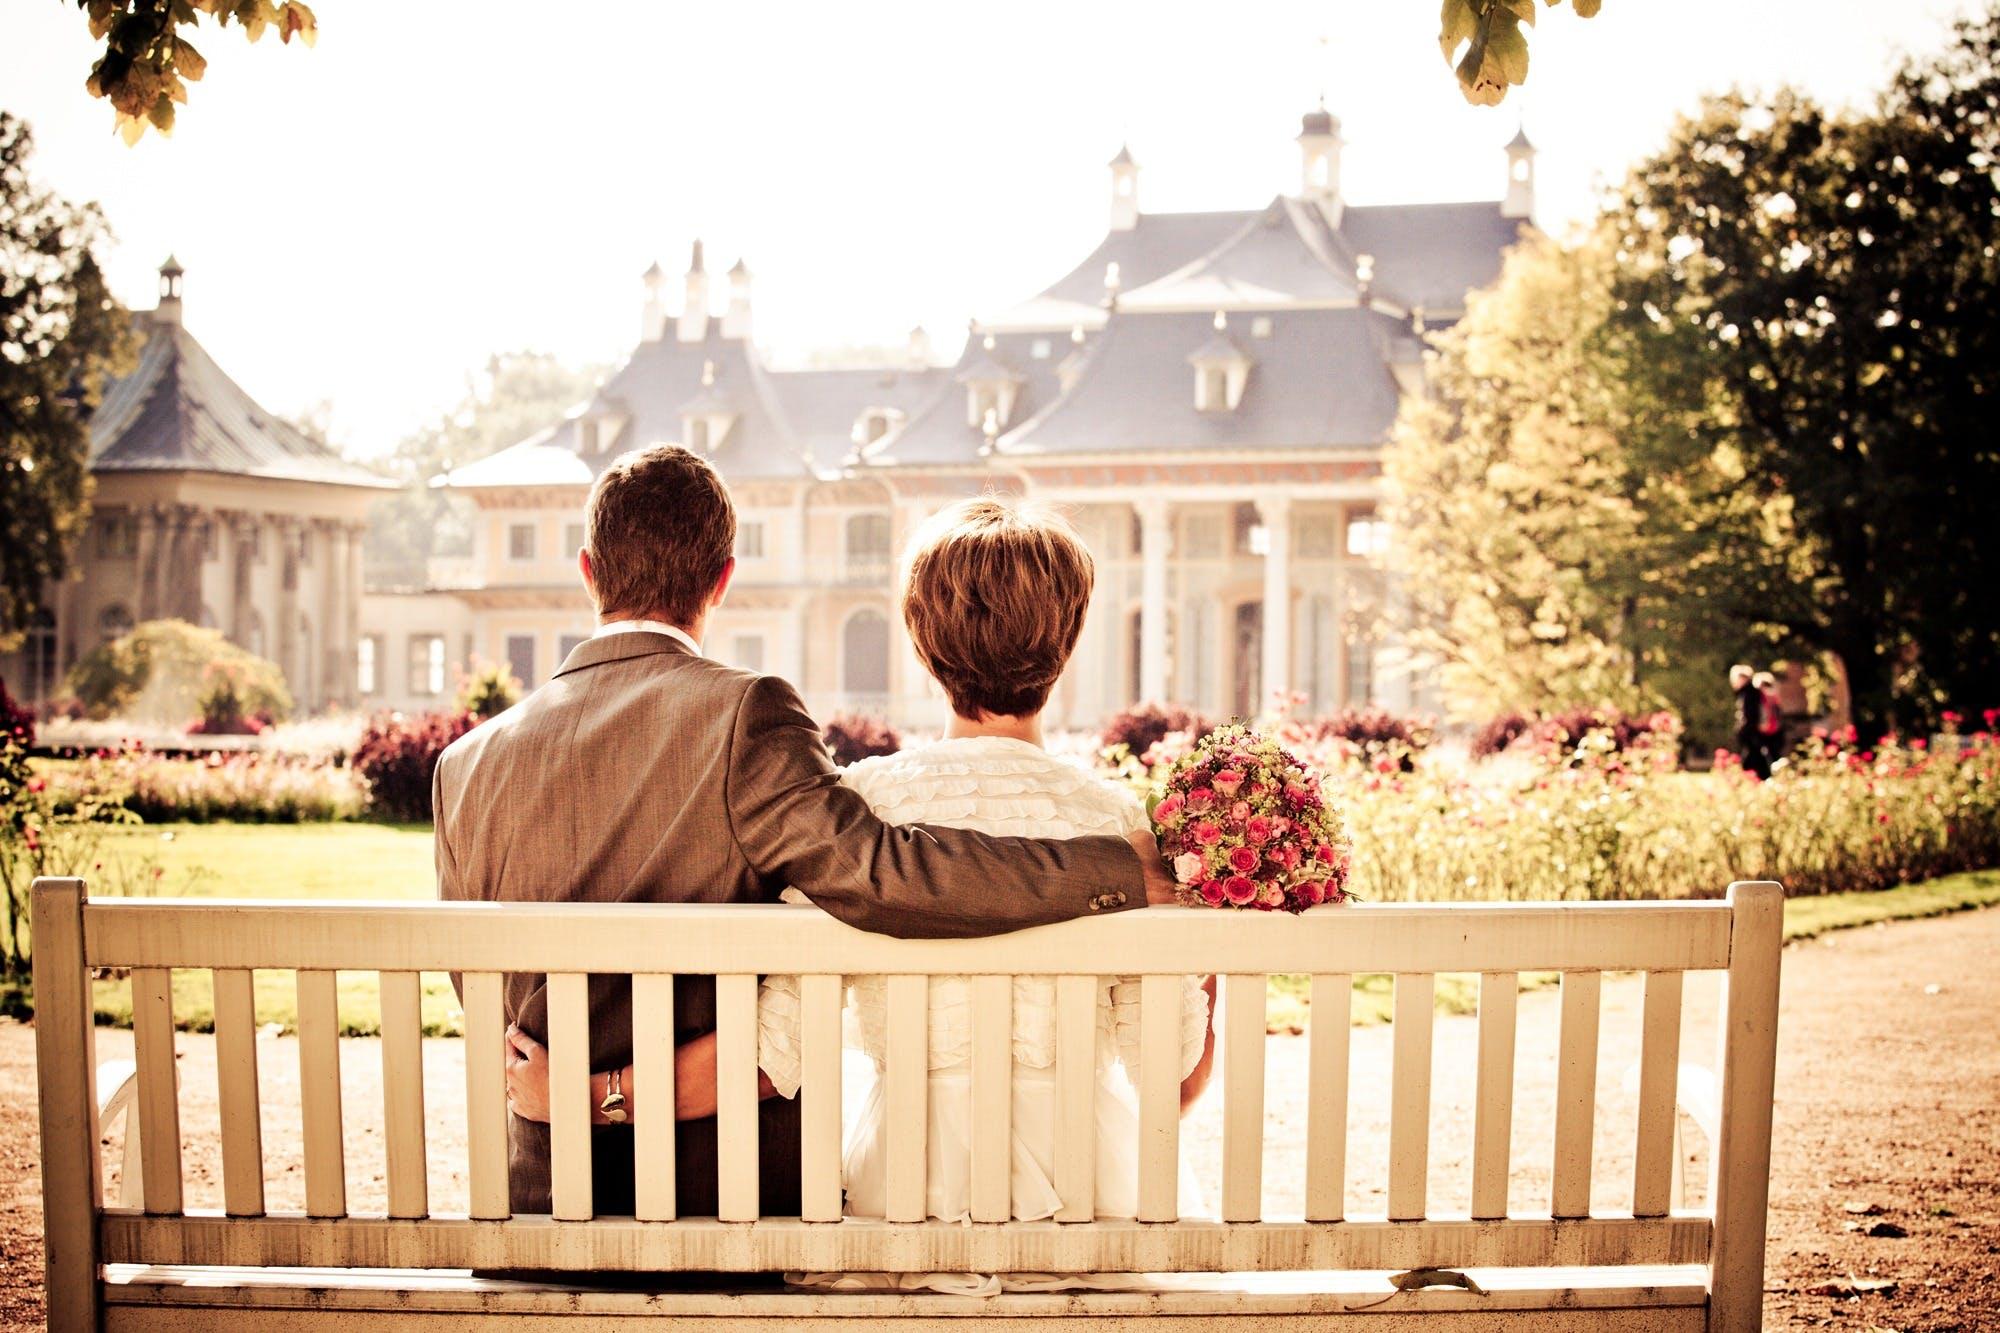 bench, bouquet, bride